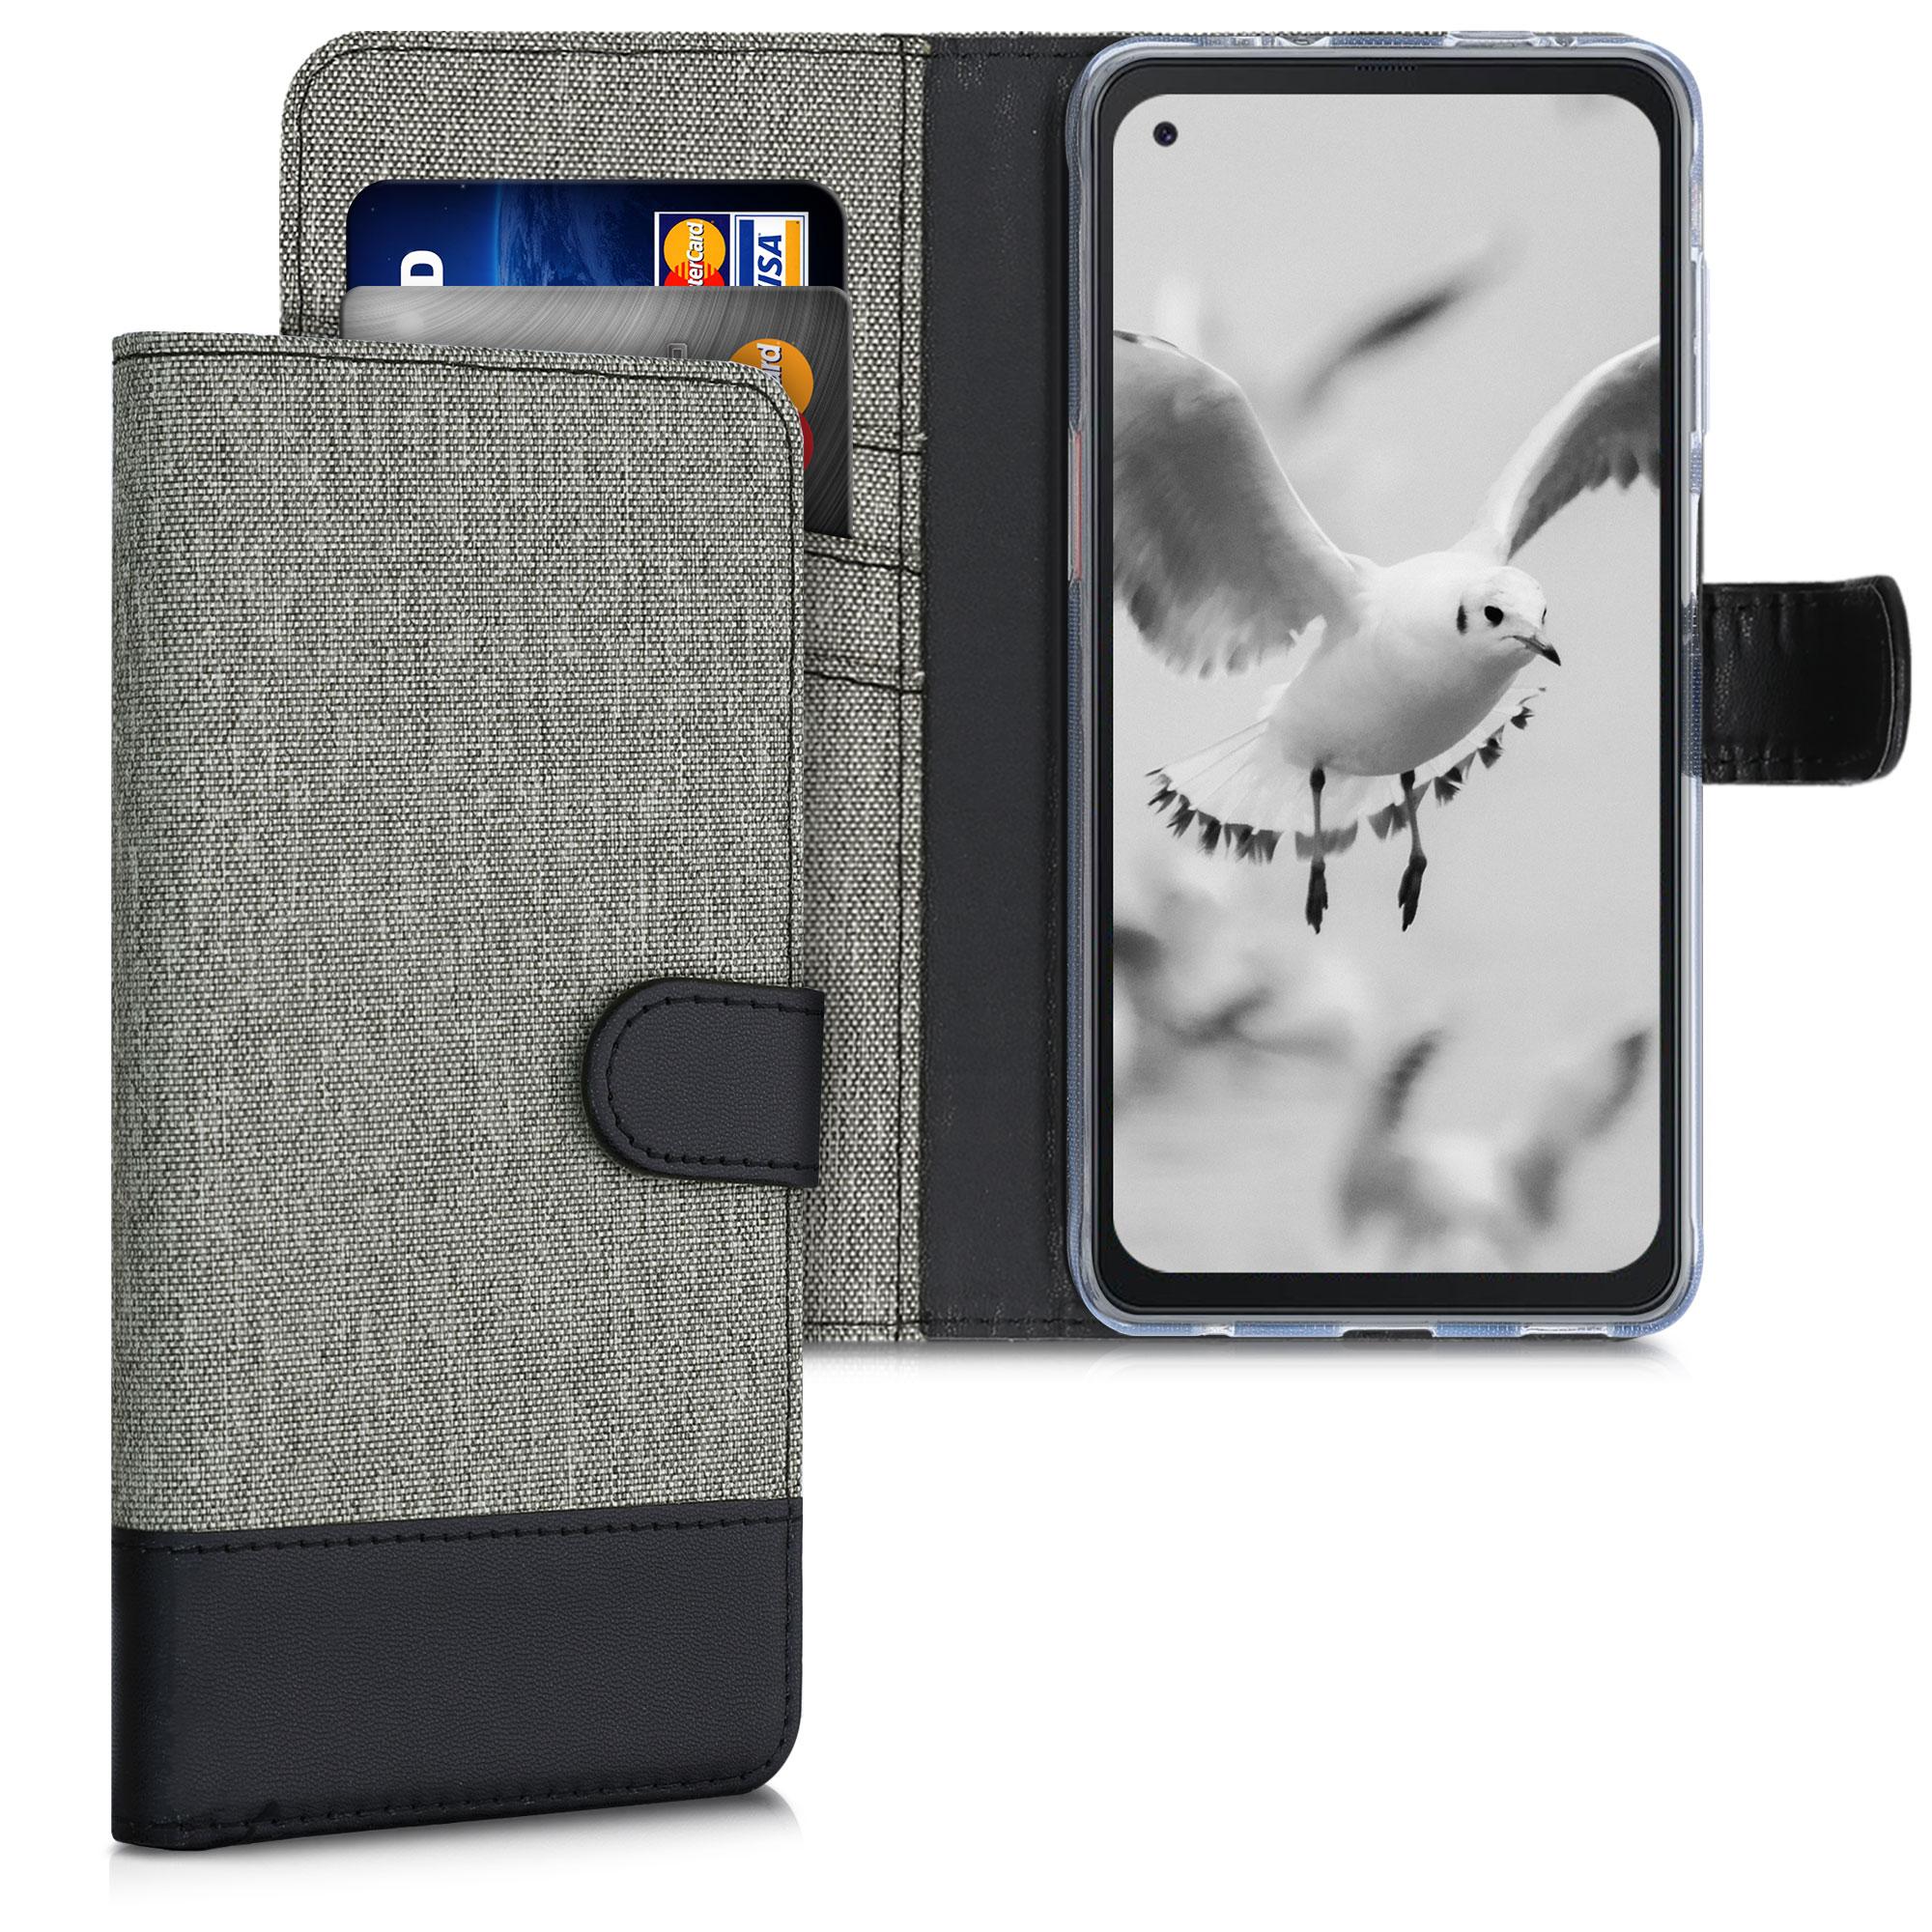 Fabricpouzdro pro Samsung Xcover Pro - šedé / černé